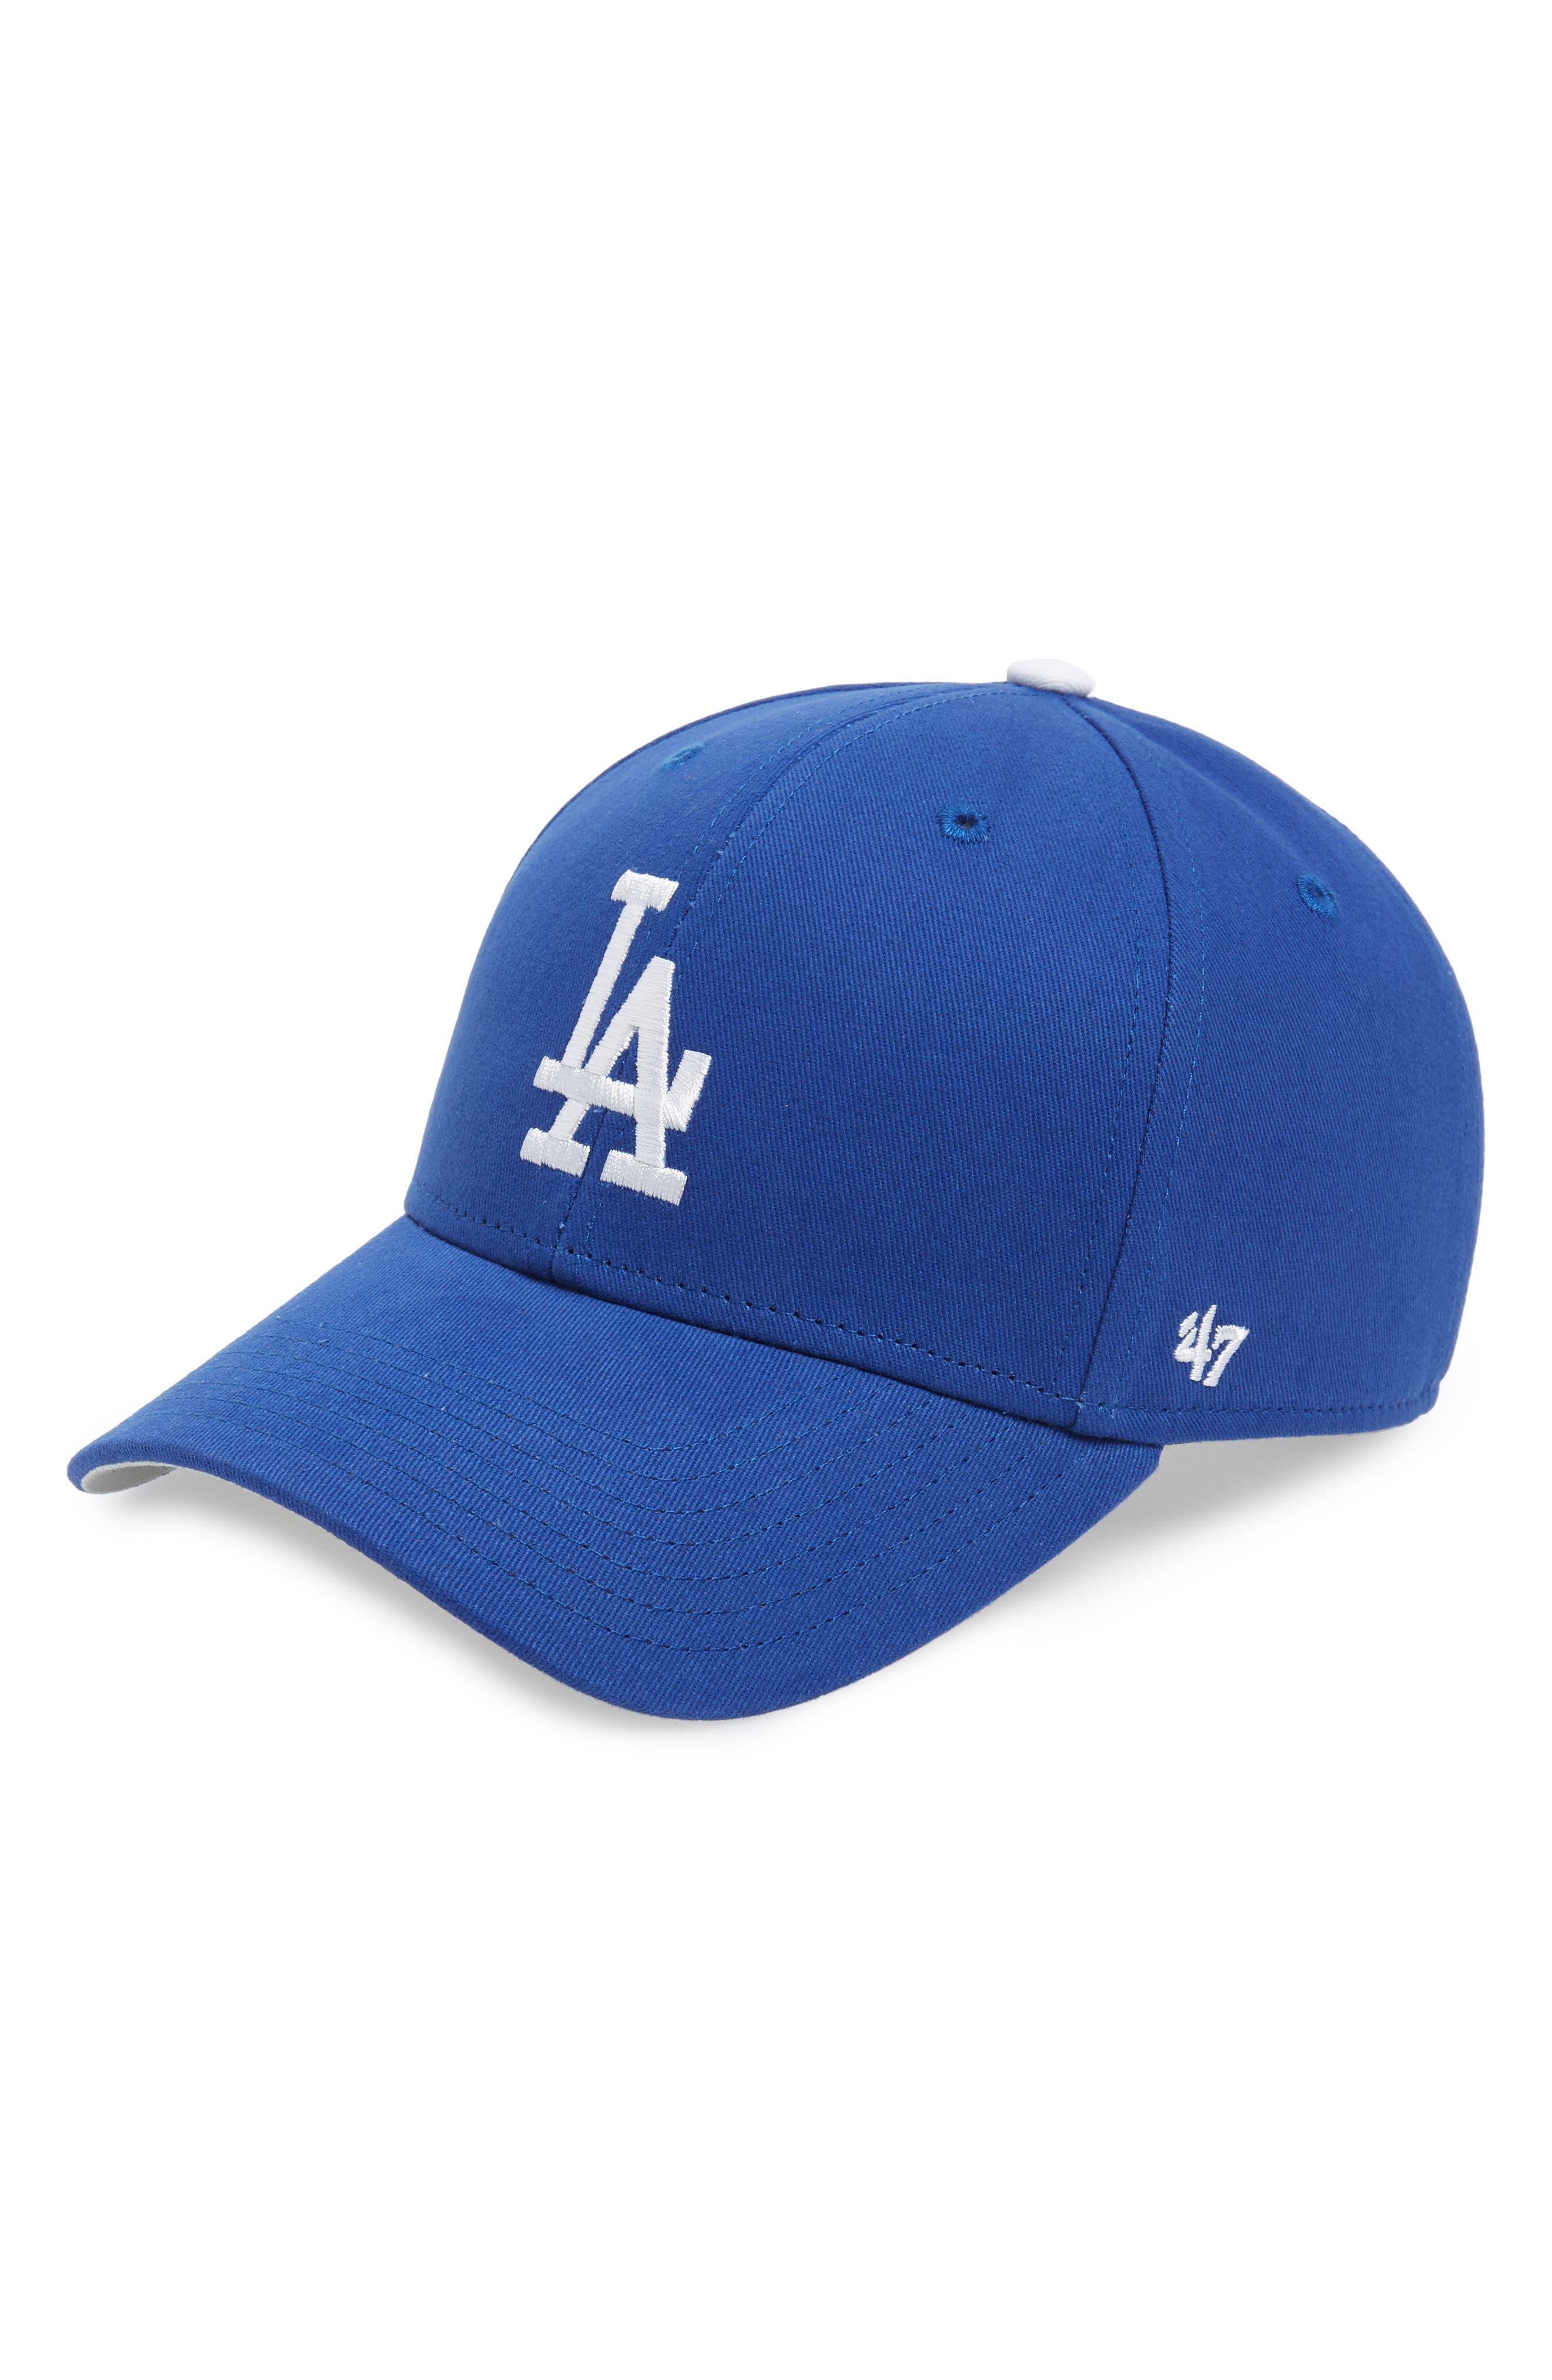 '47 Los Angeles Dodgers Baseball Cap, Main, color, BLUE